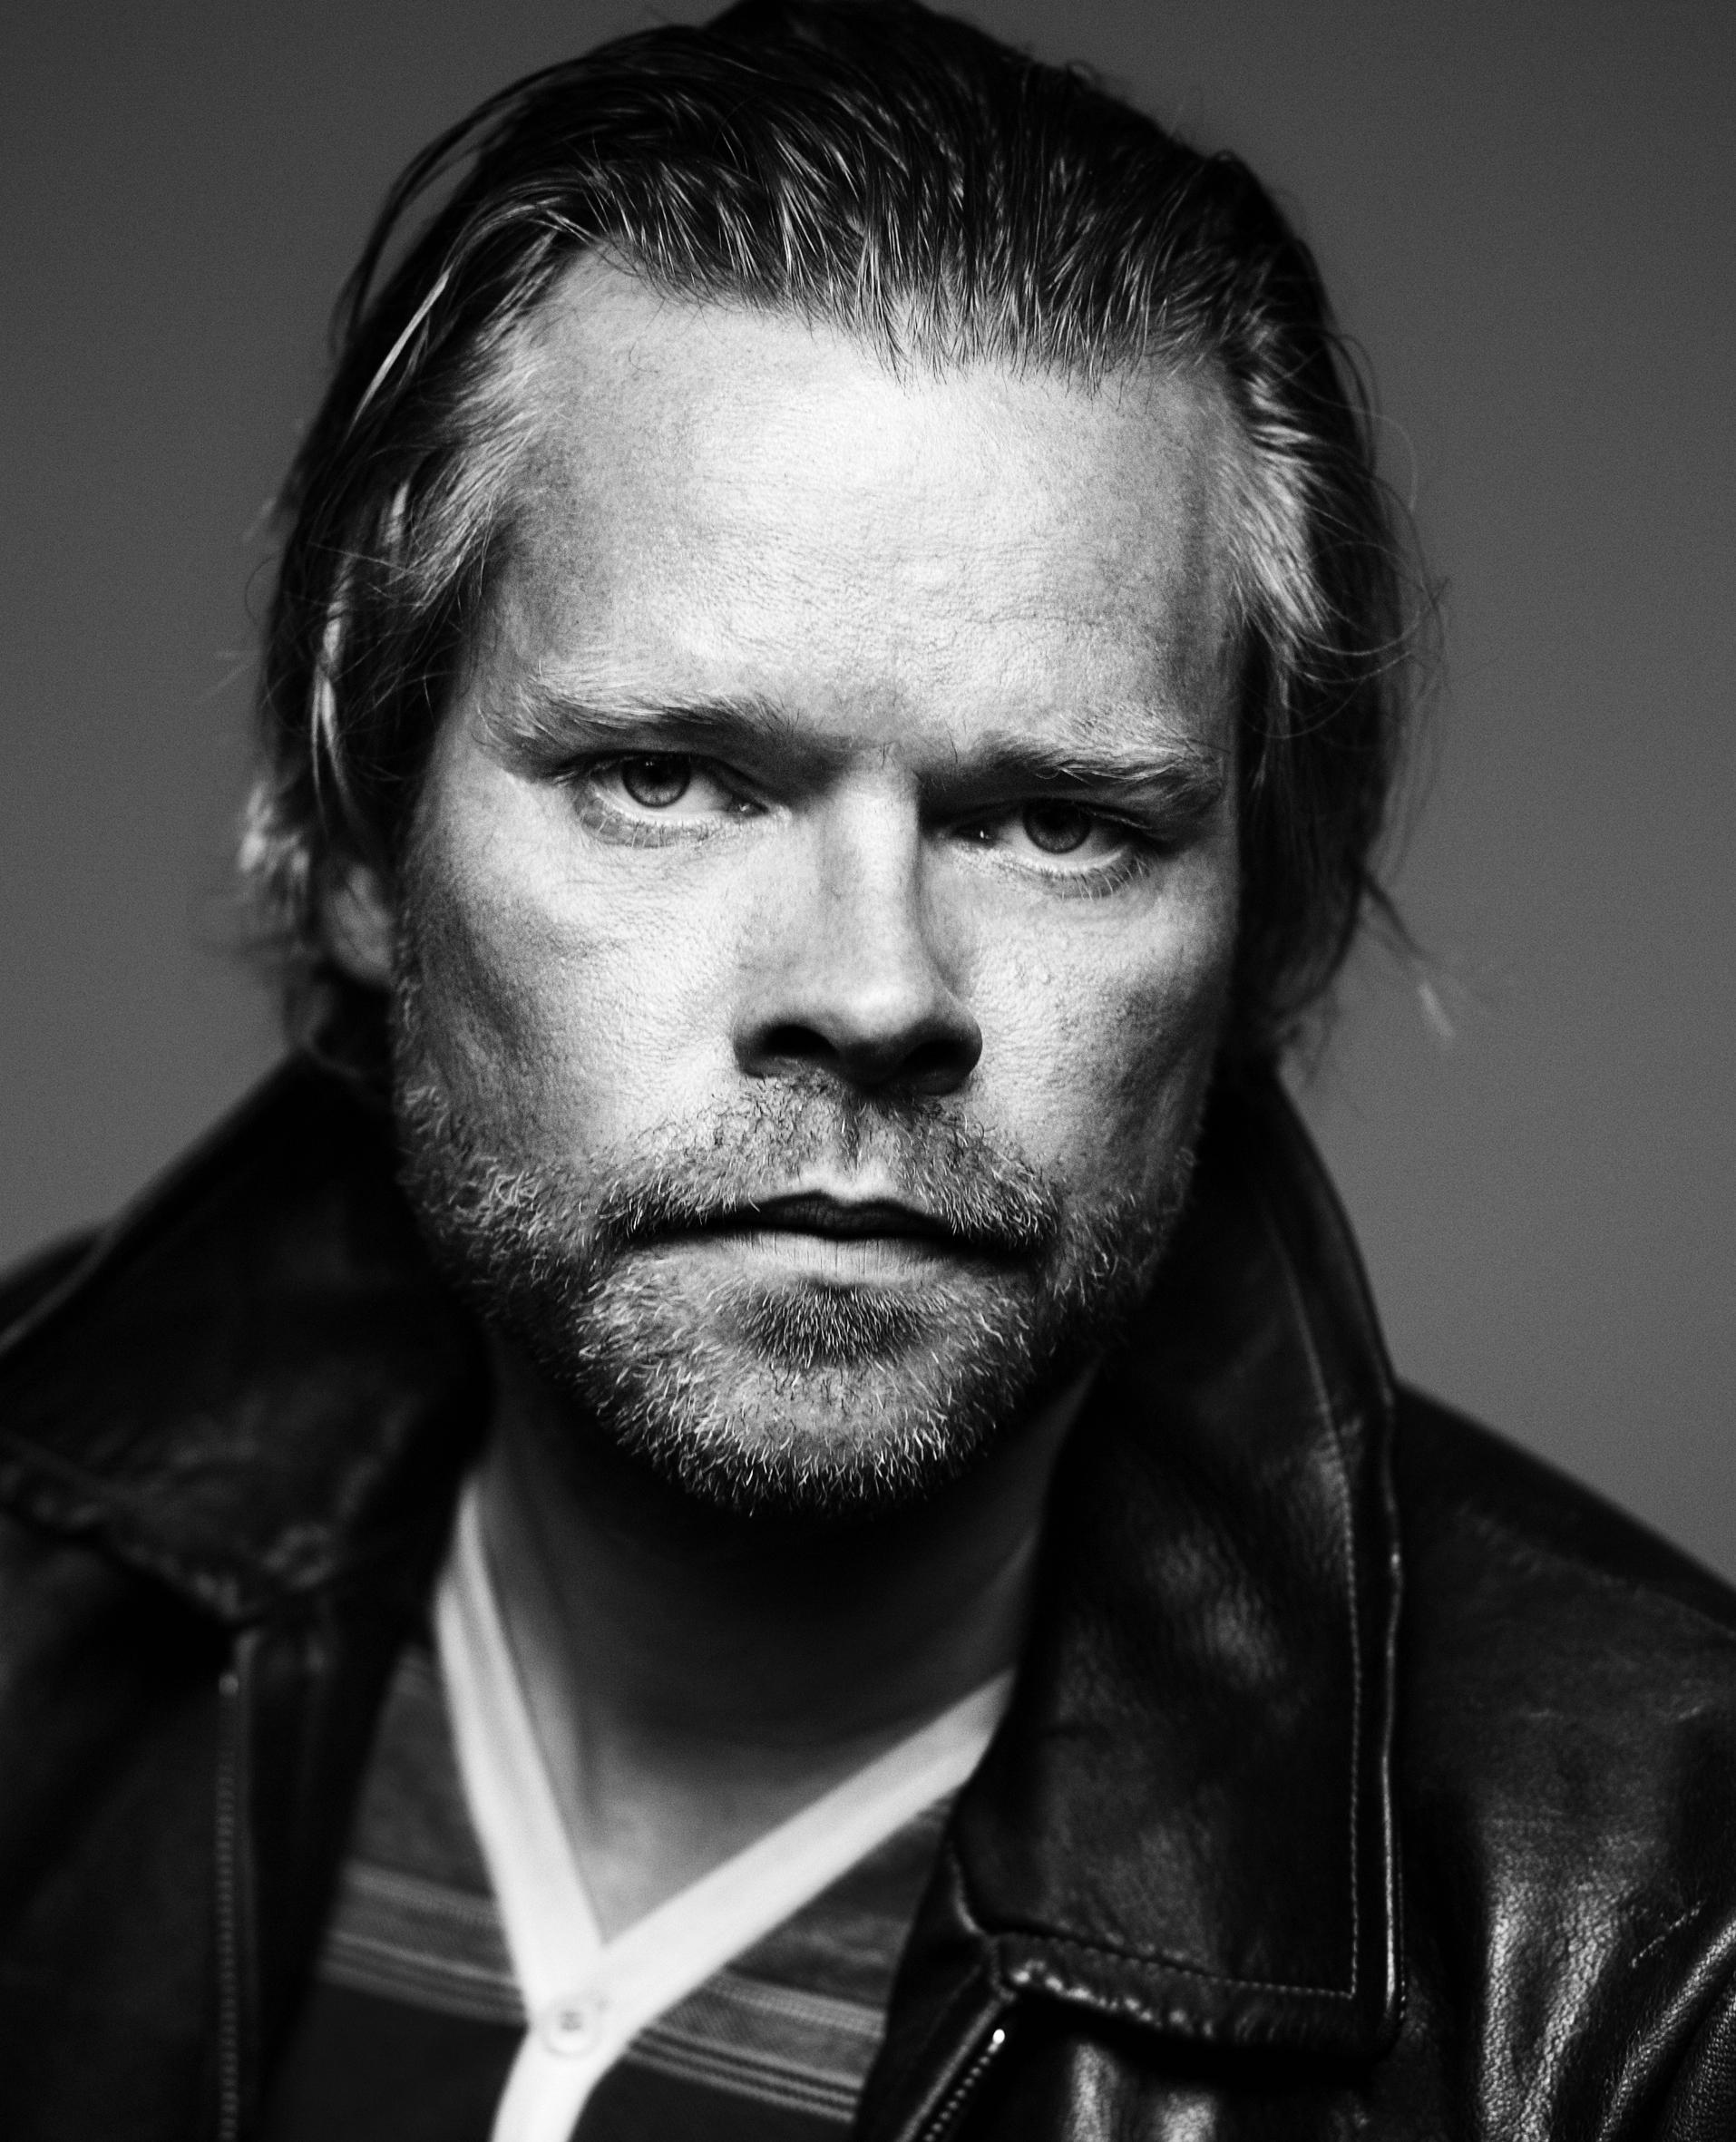 Stig Sæterbakken in 2007